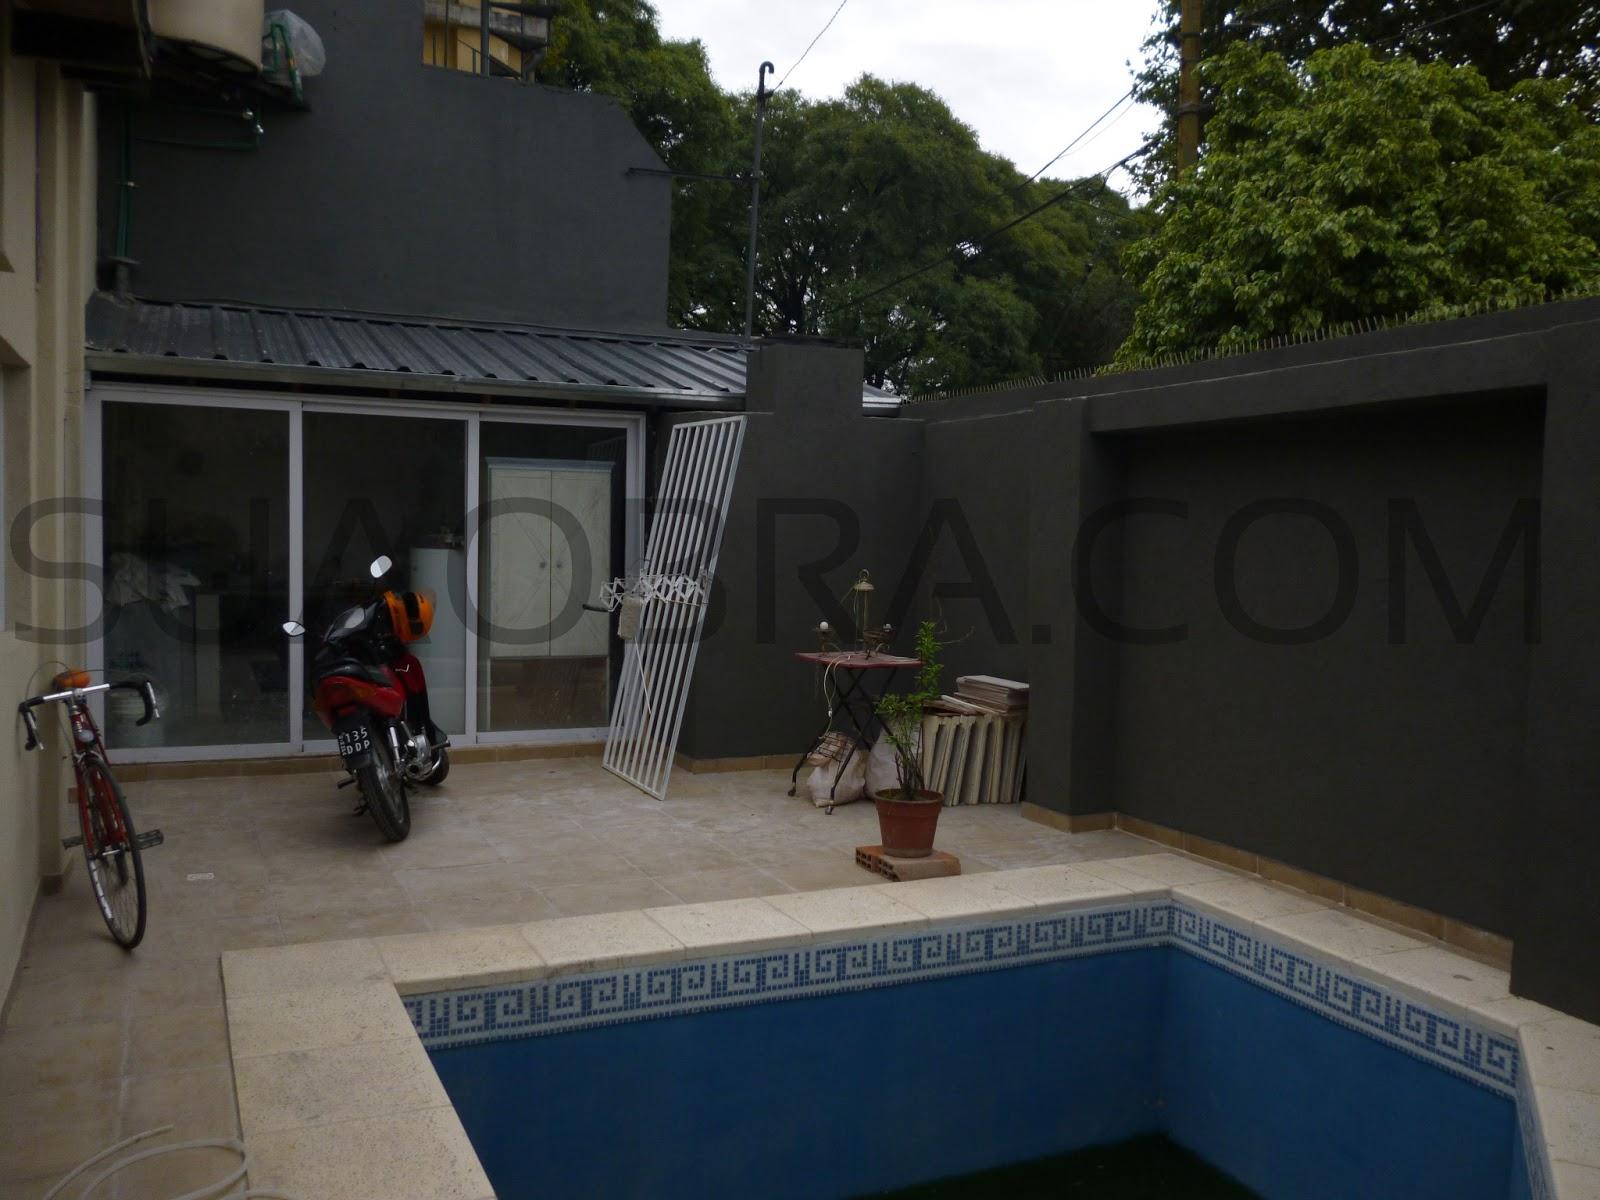 Londres roma revestimiento para paredes exteriores de for Revestimiento de paredes exteriores baratos